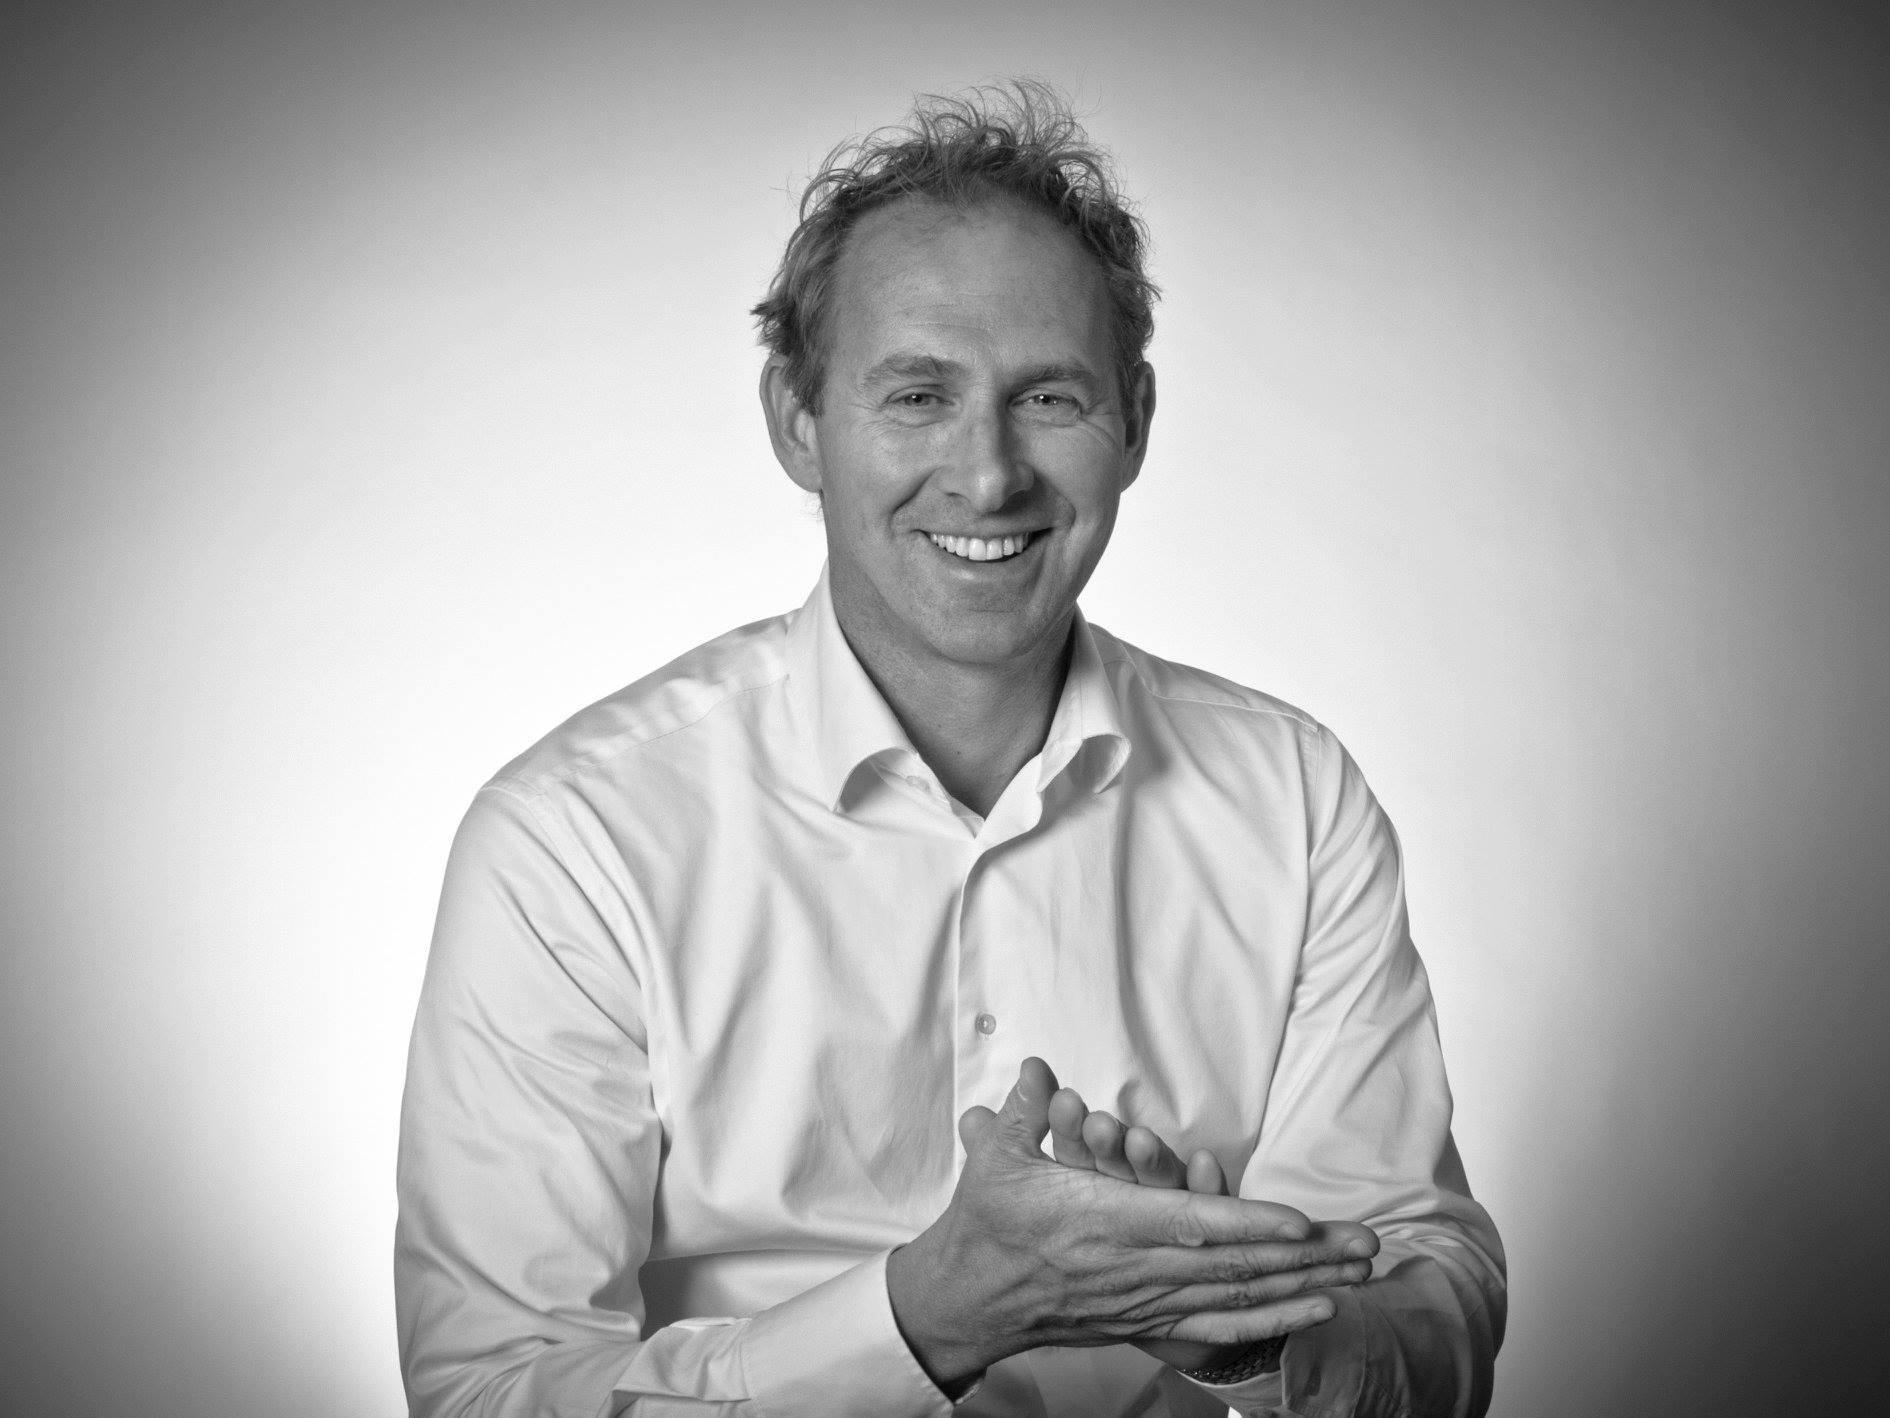 Simon Neefjes vertrekt bij TBWA, Rik Ledder wordt CEO TBWA\NEBOKO